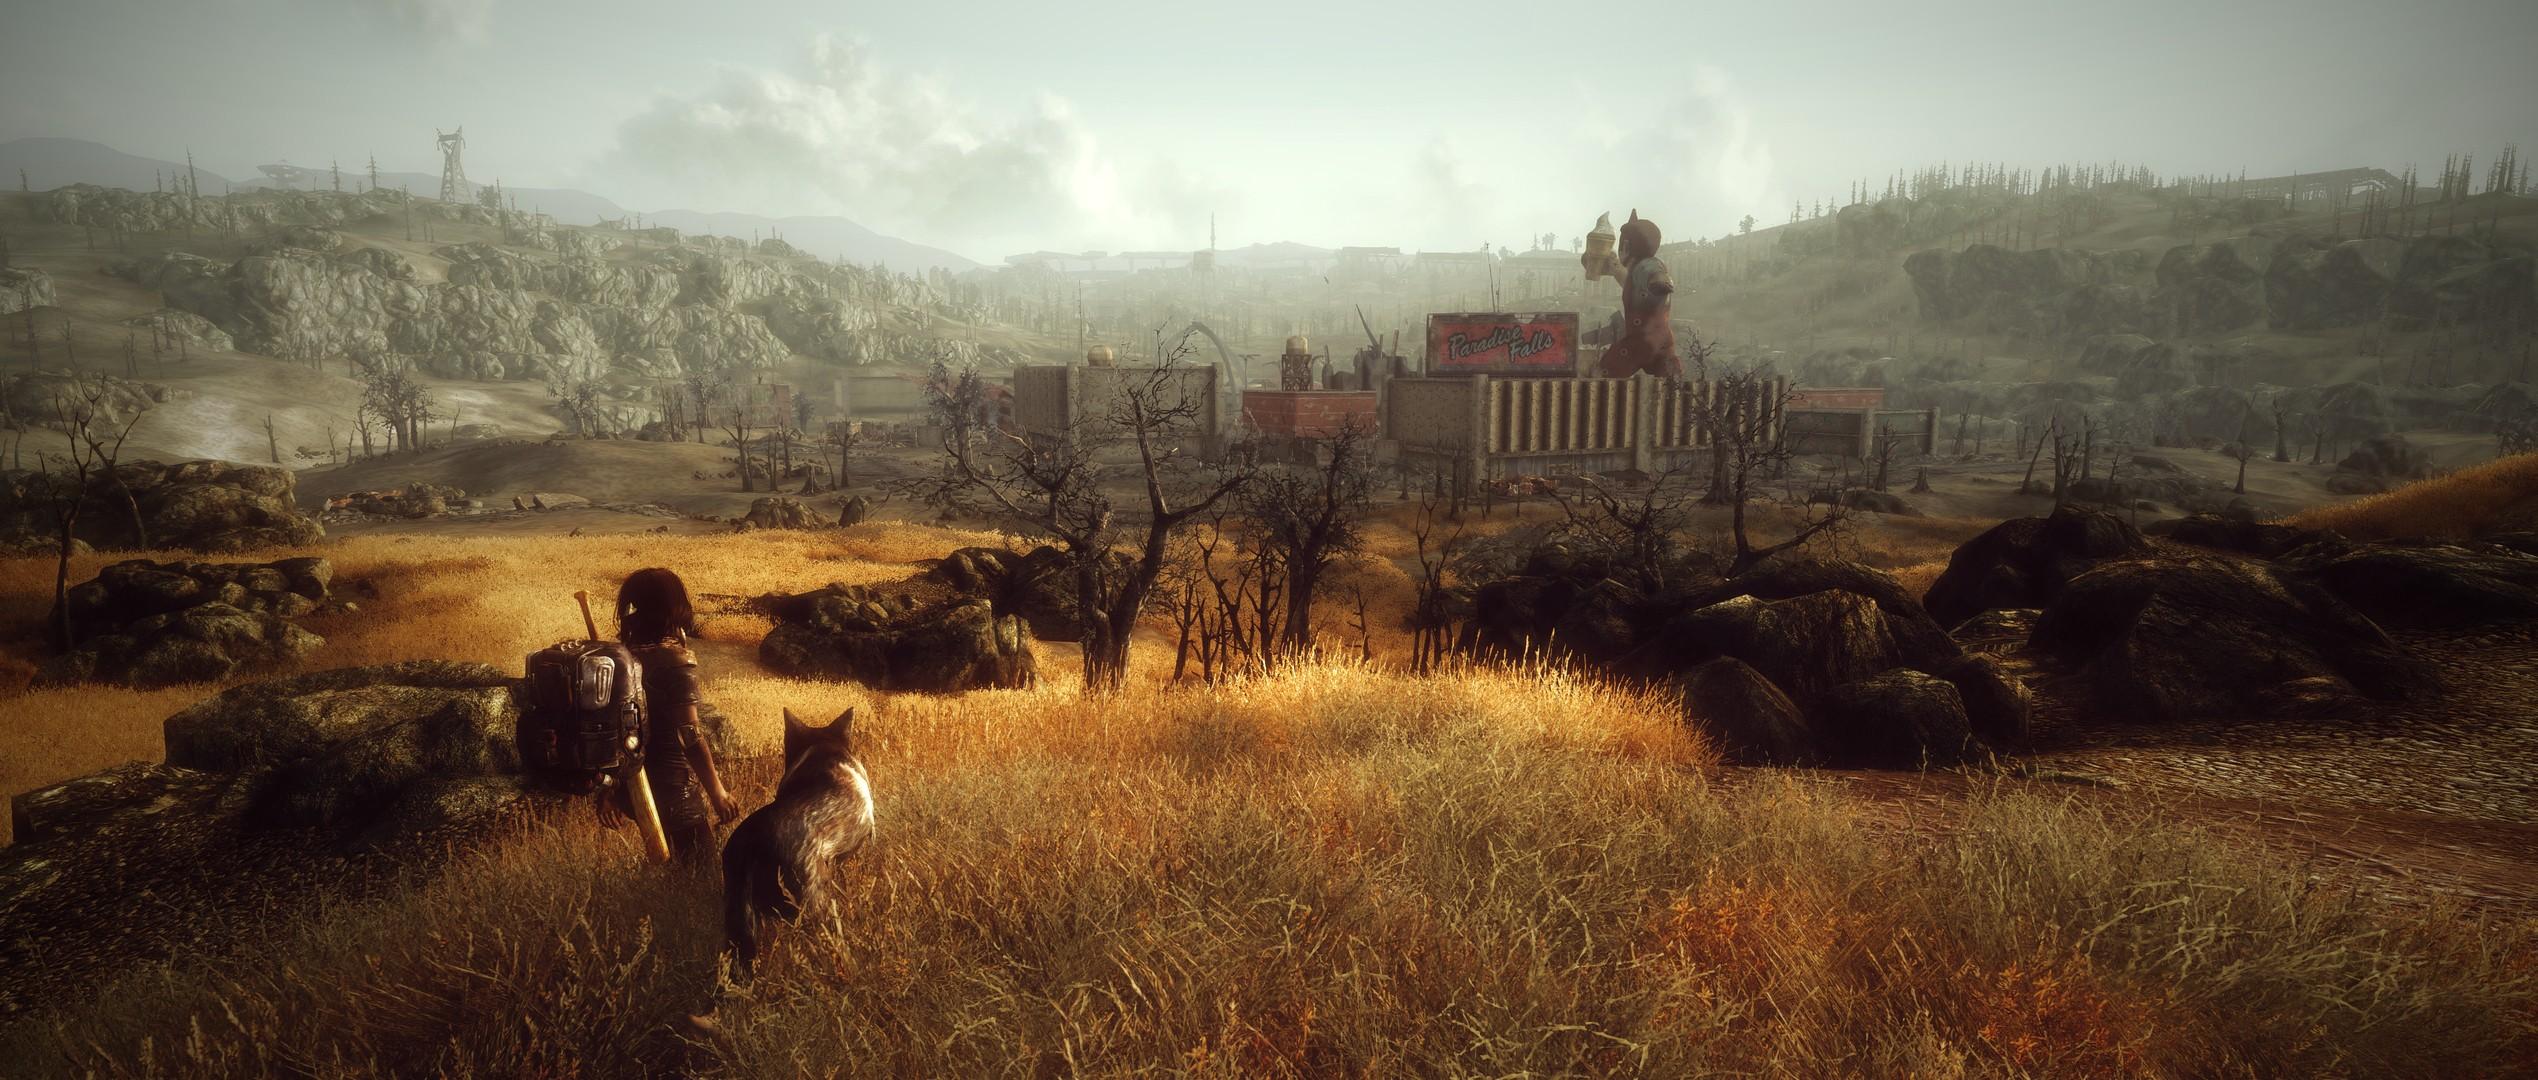 Fallout 4 1280x1024 4